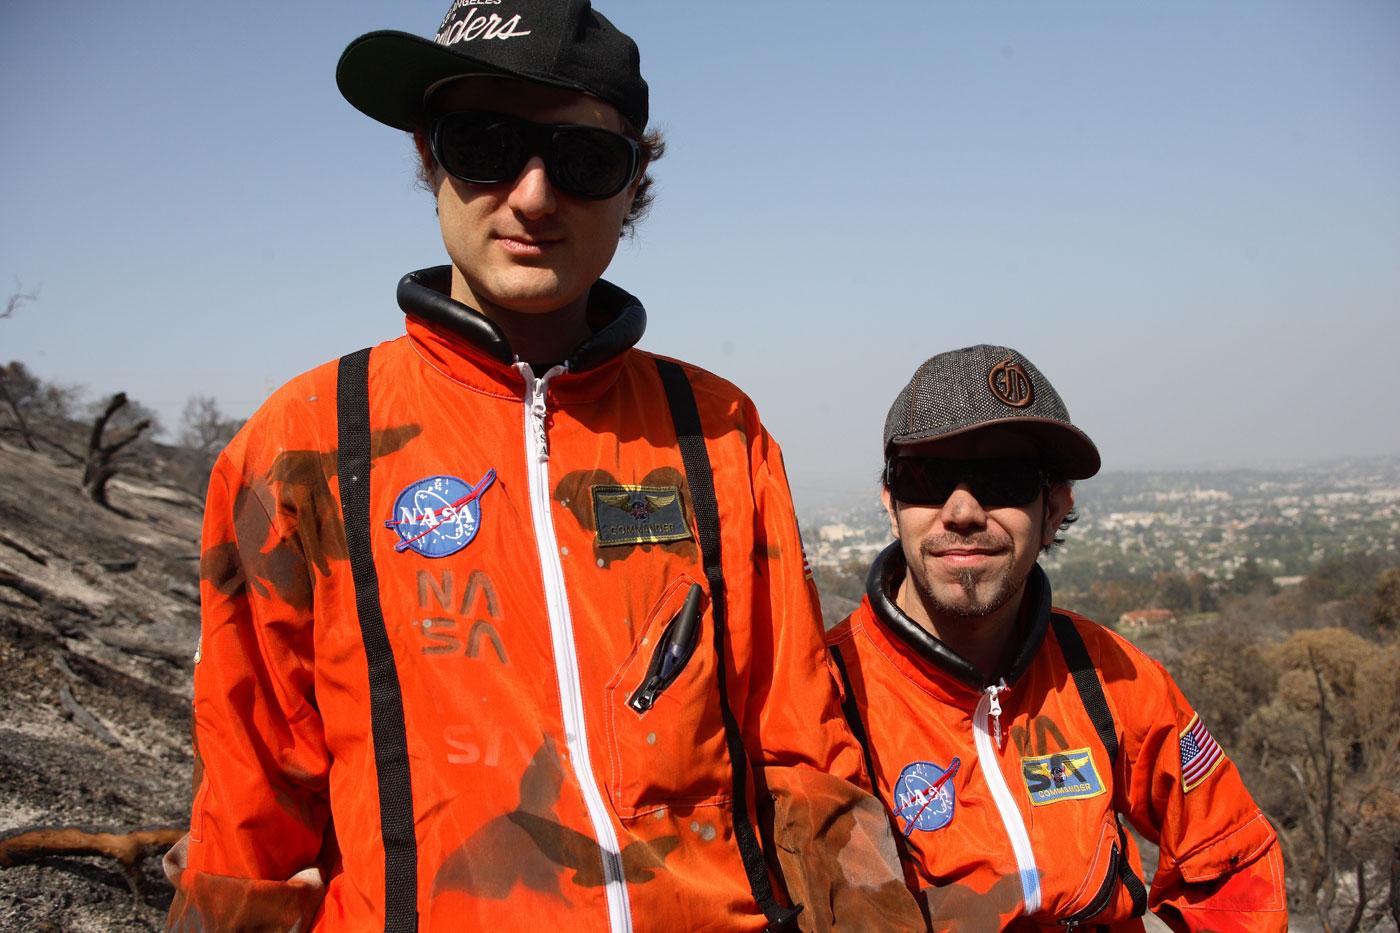 DJ Zegon and Squeak E. Clean: Aeronautical enthusiasts, presumably...